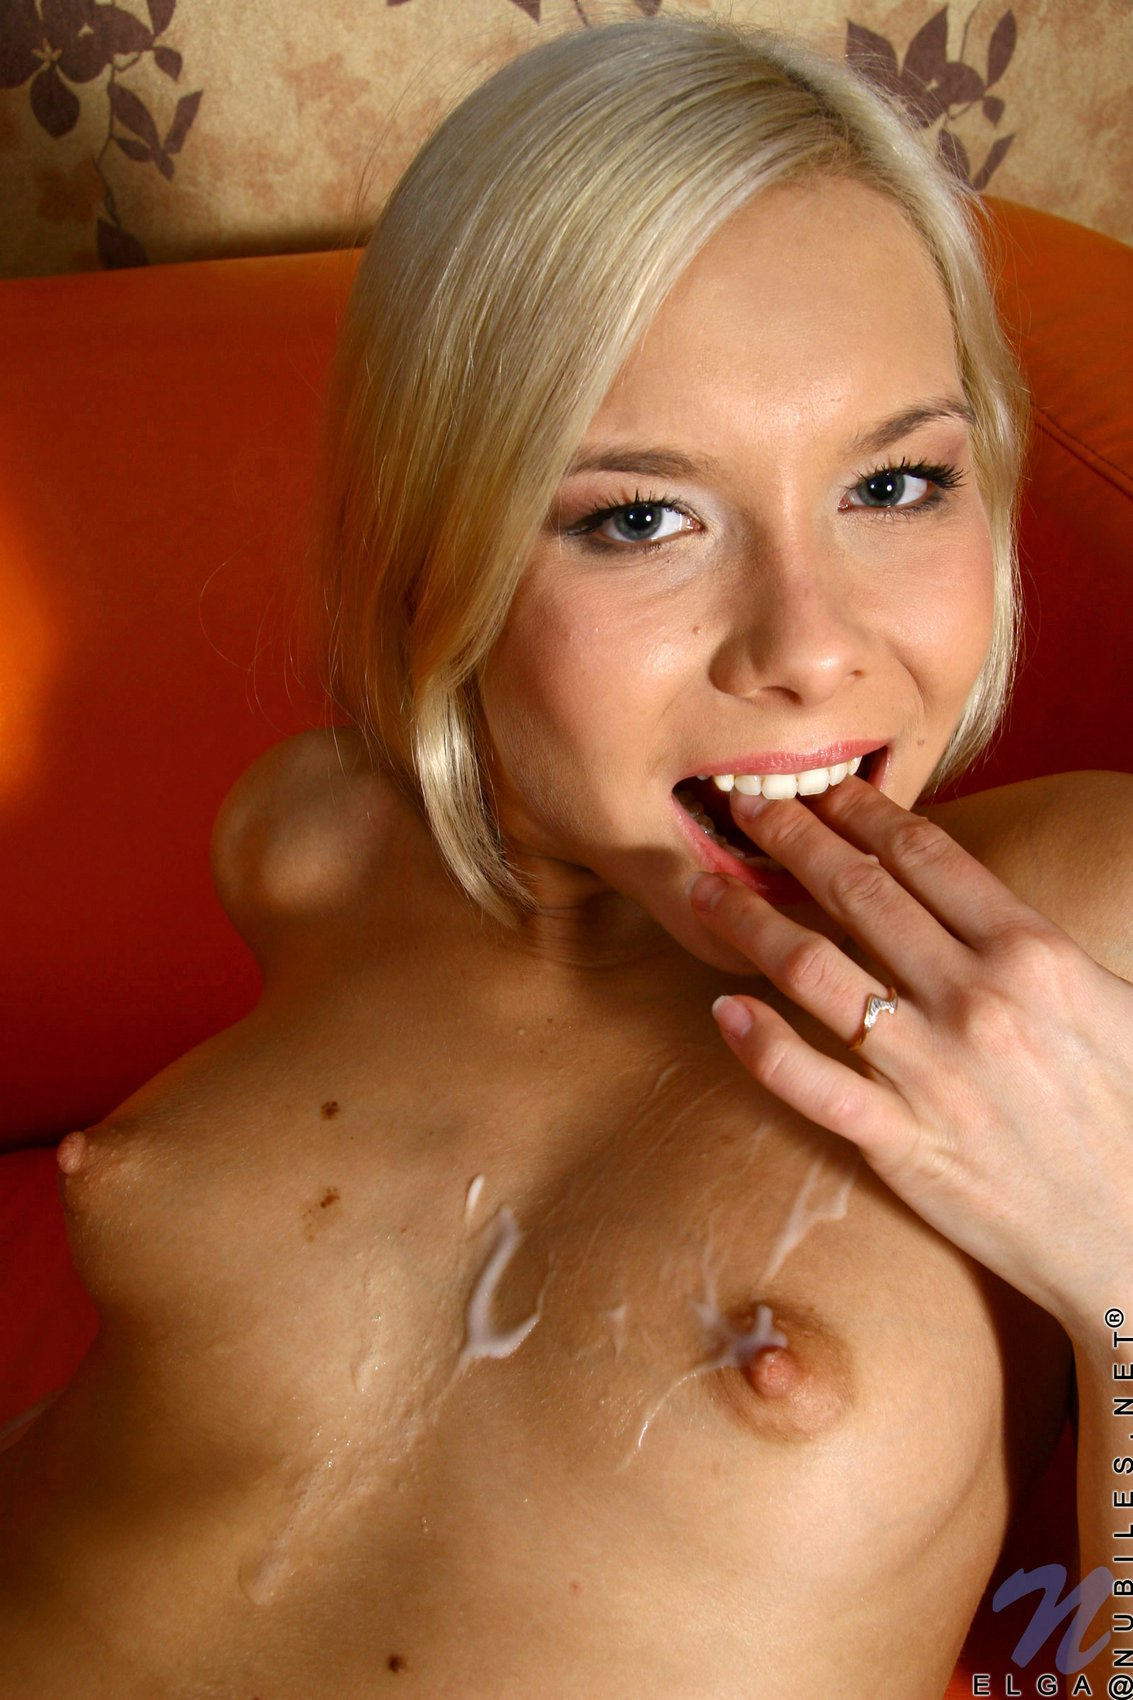 Double anal big tit porn star fuck - 58 part 5